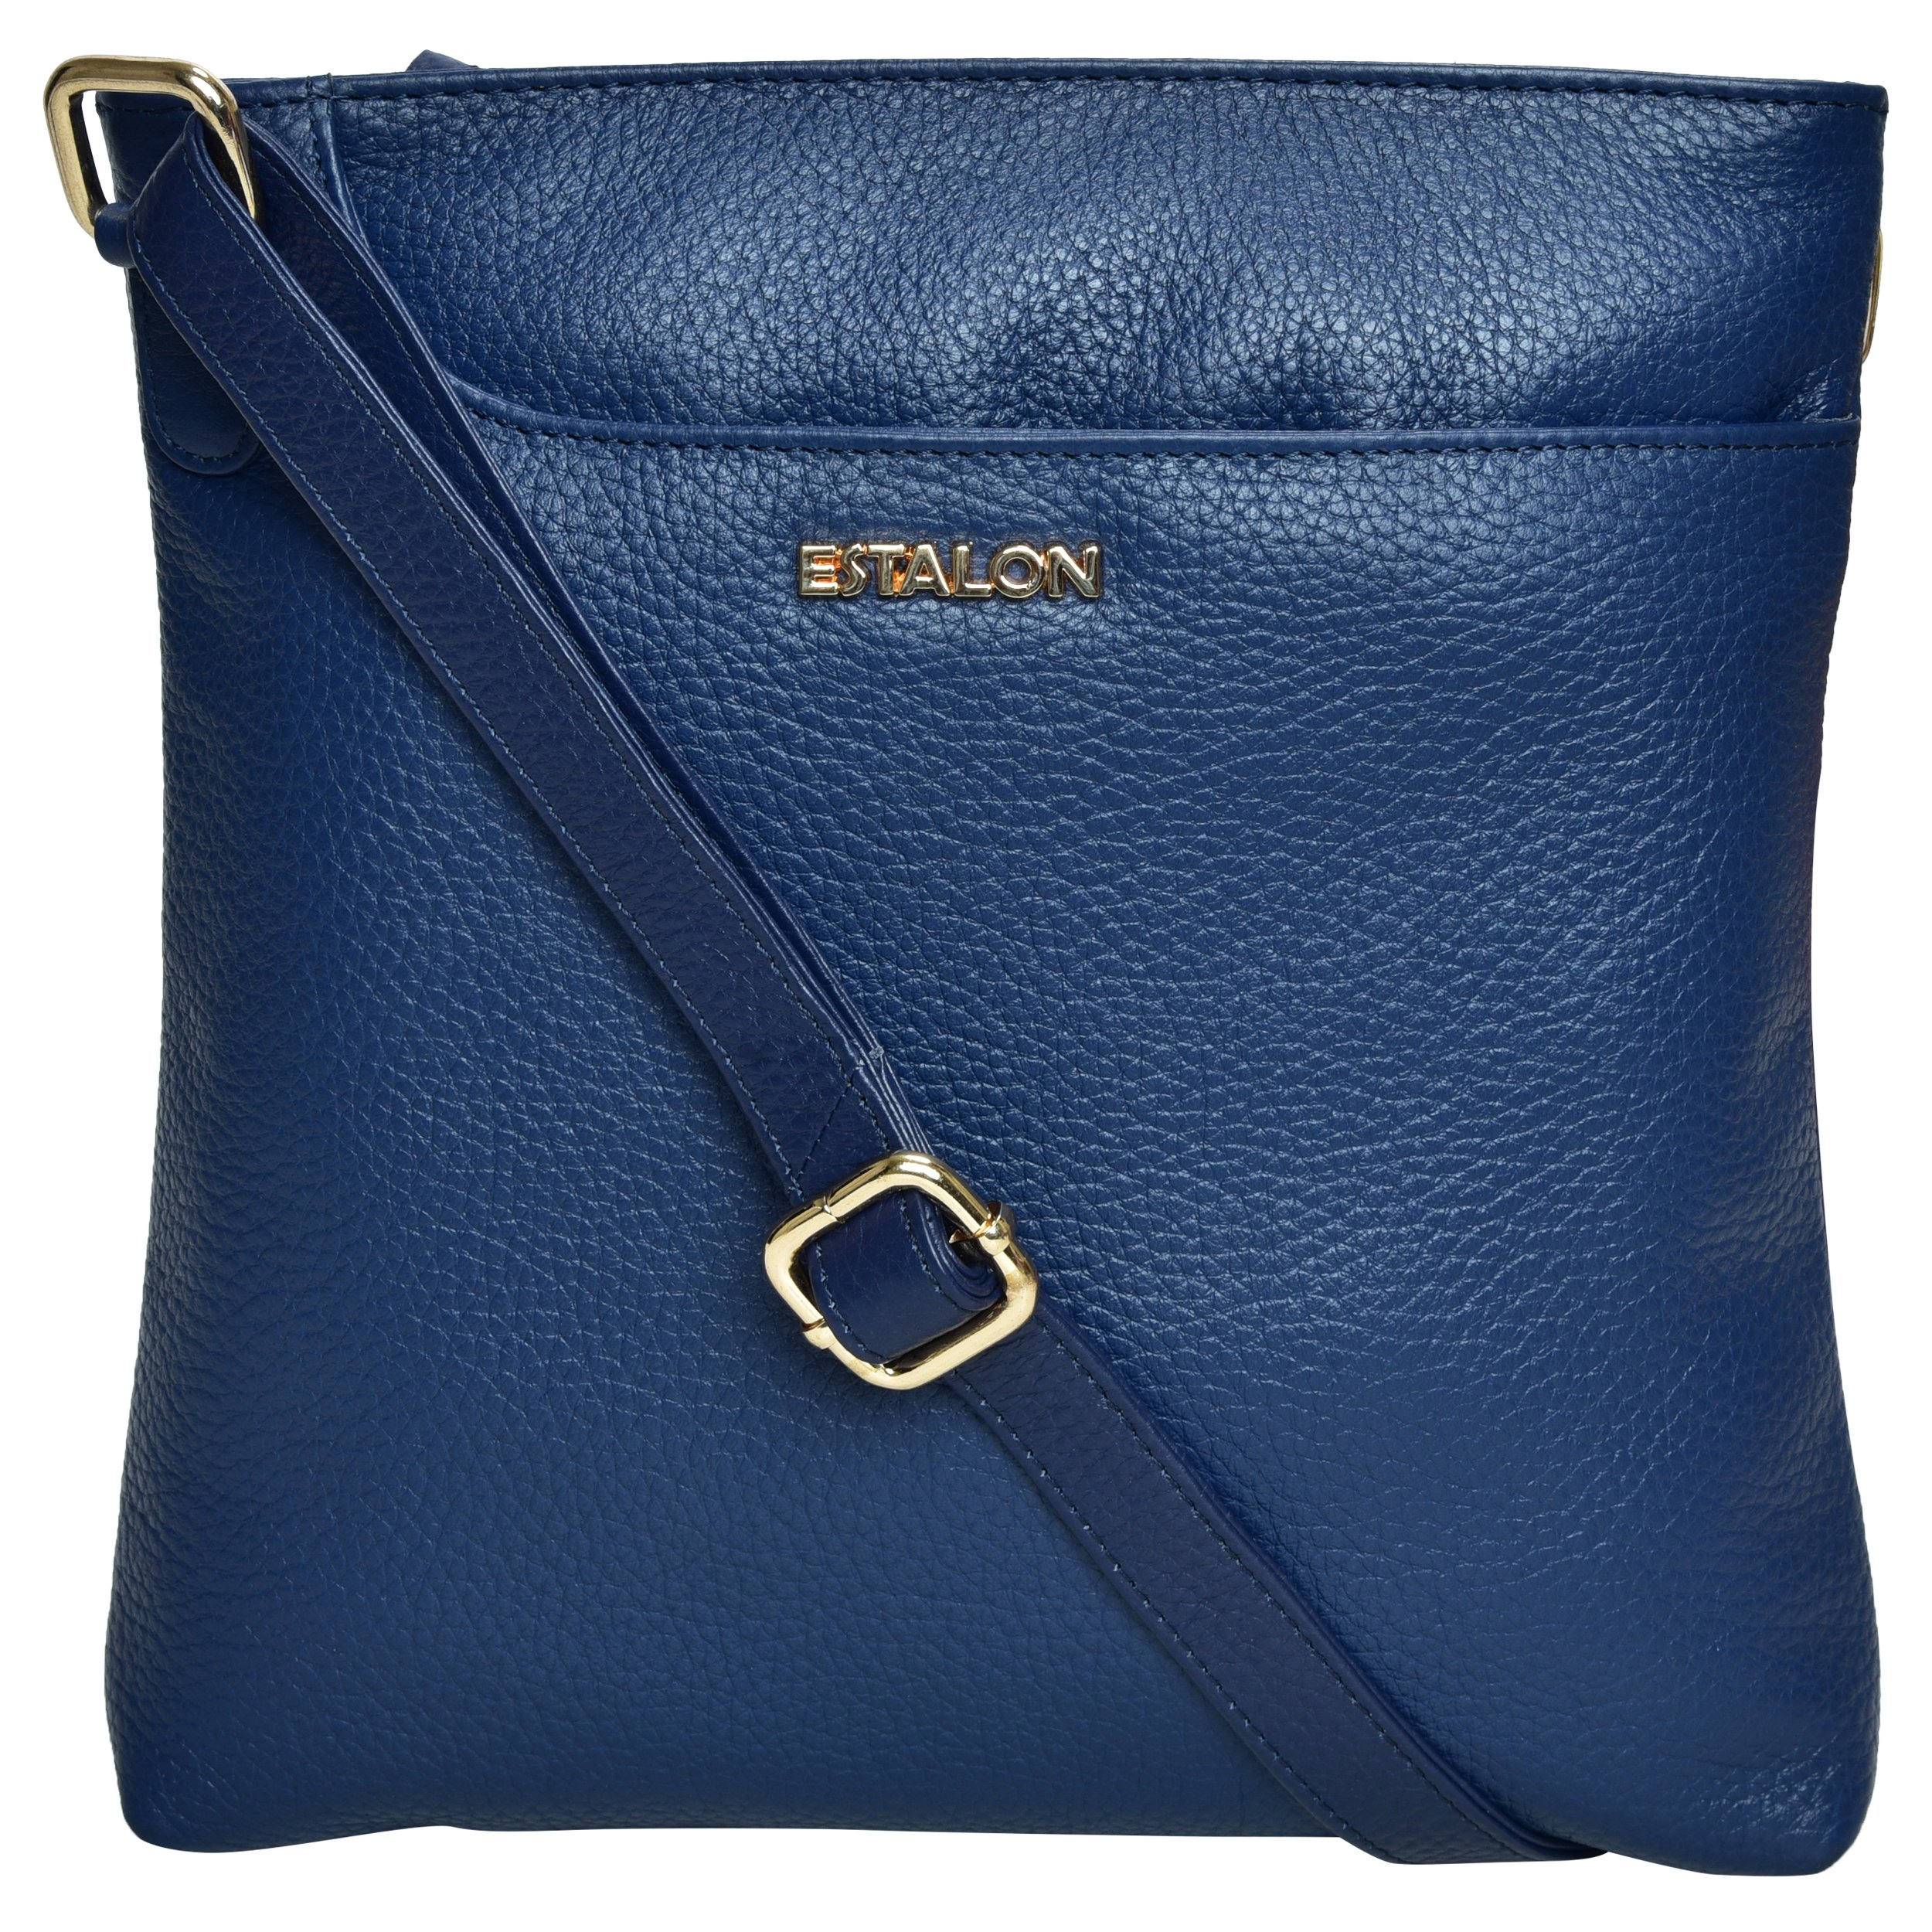 Premium Leather Crossbody Slim Bag for Women - Handmade Cross Body Over the Shoulder Purse Luxury Womens (Navy Pebble)